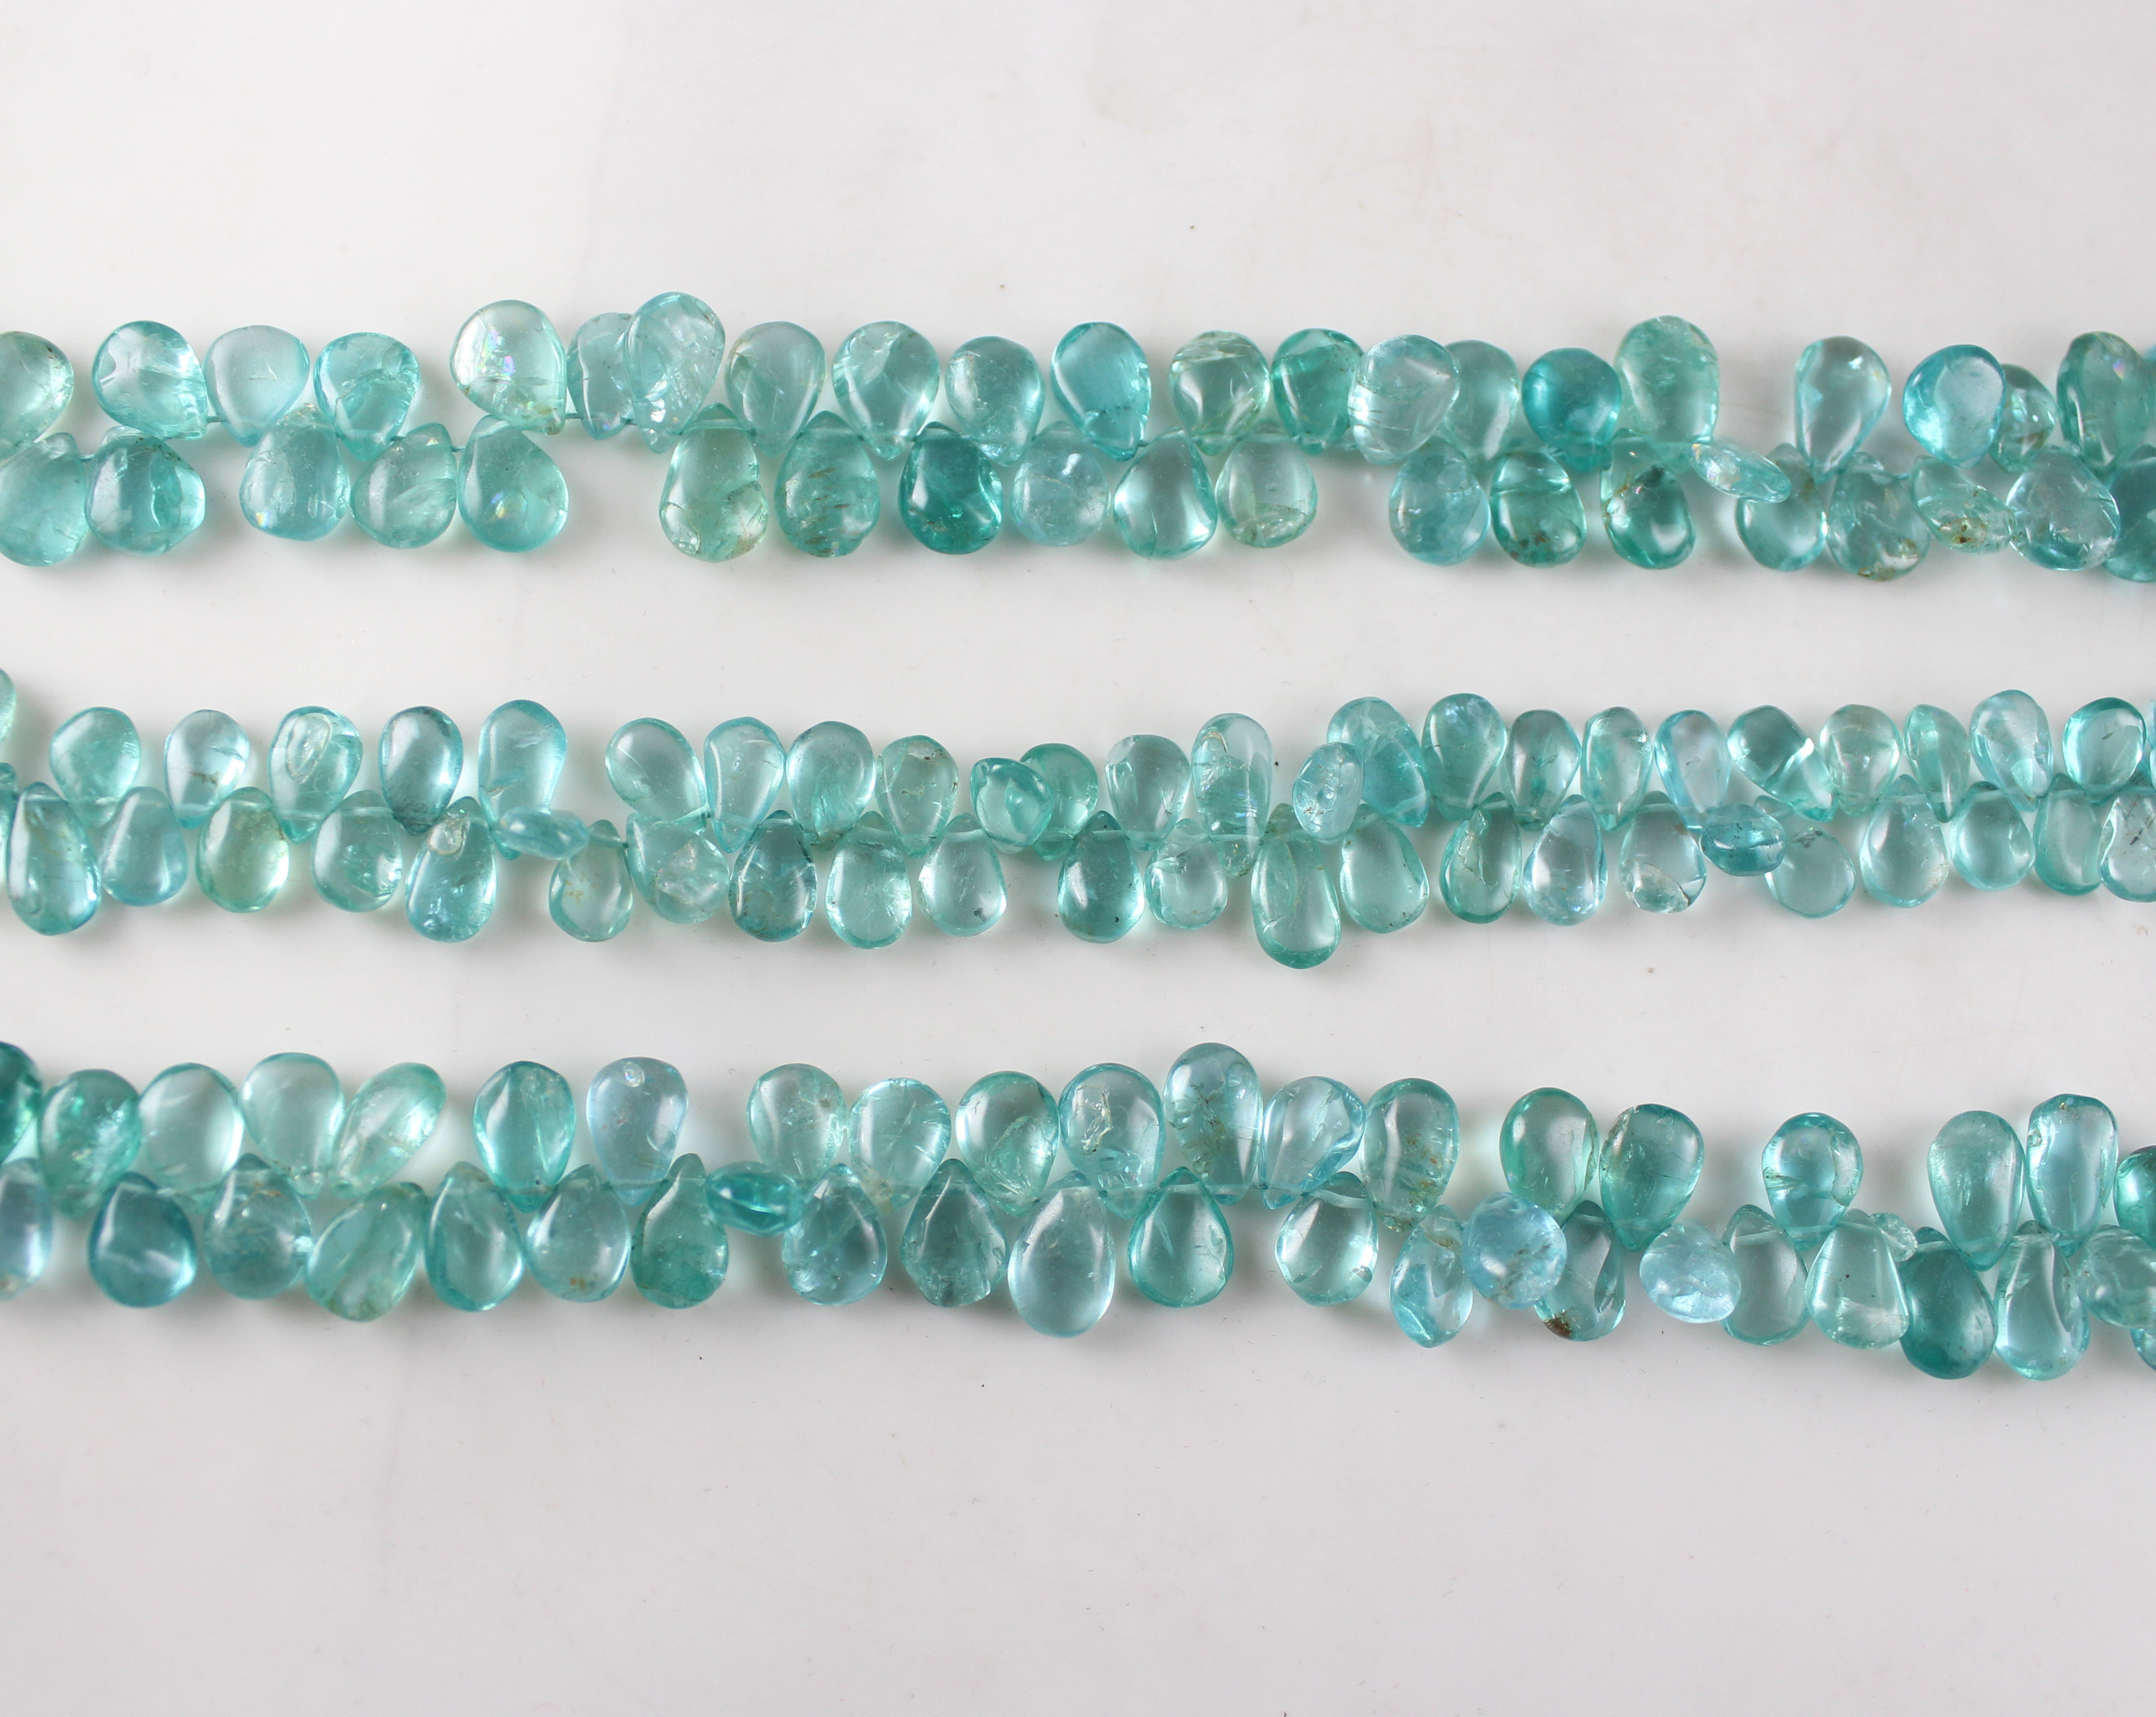 Apatite Plain Pears Beads